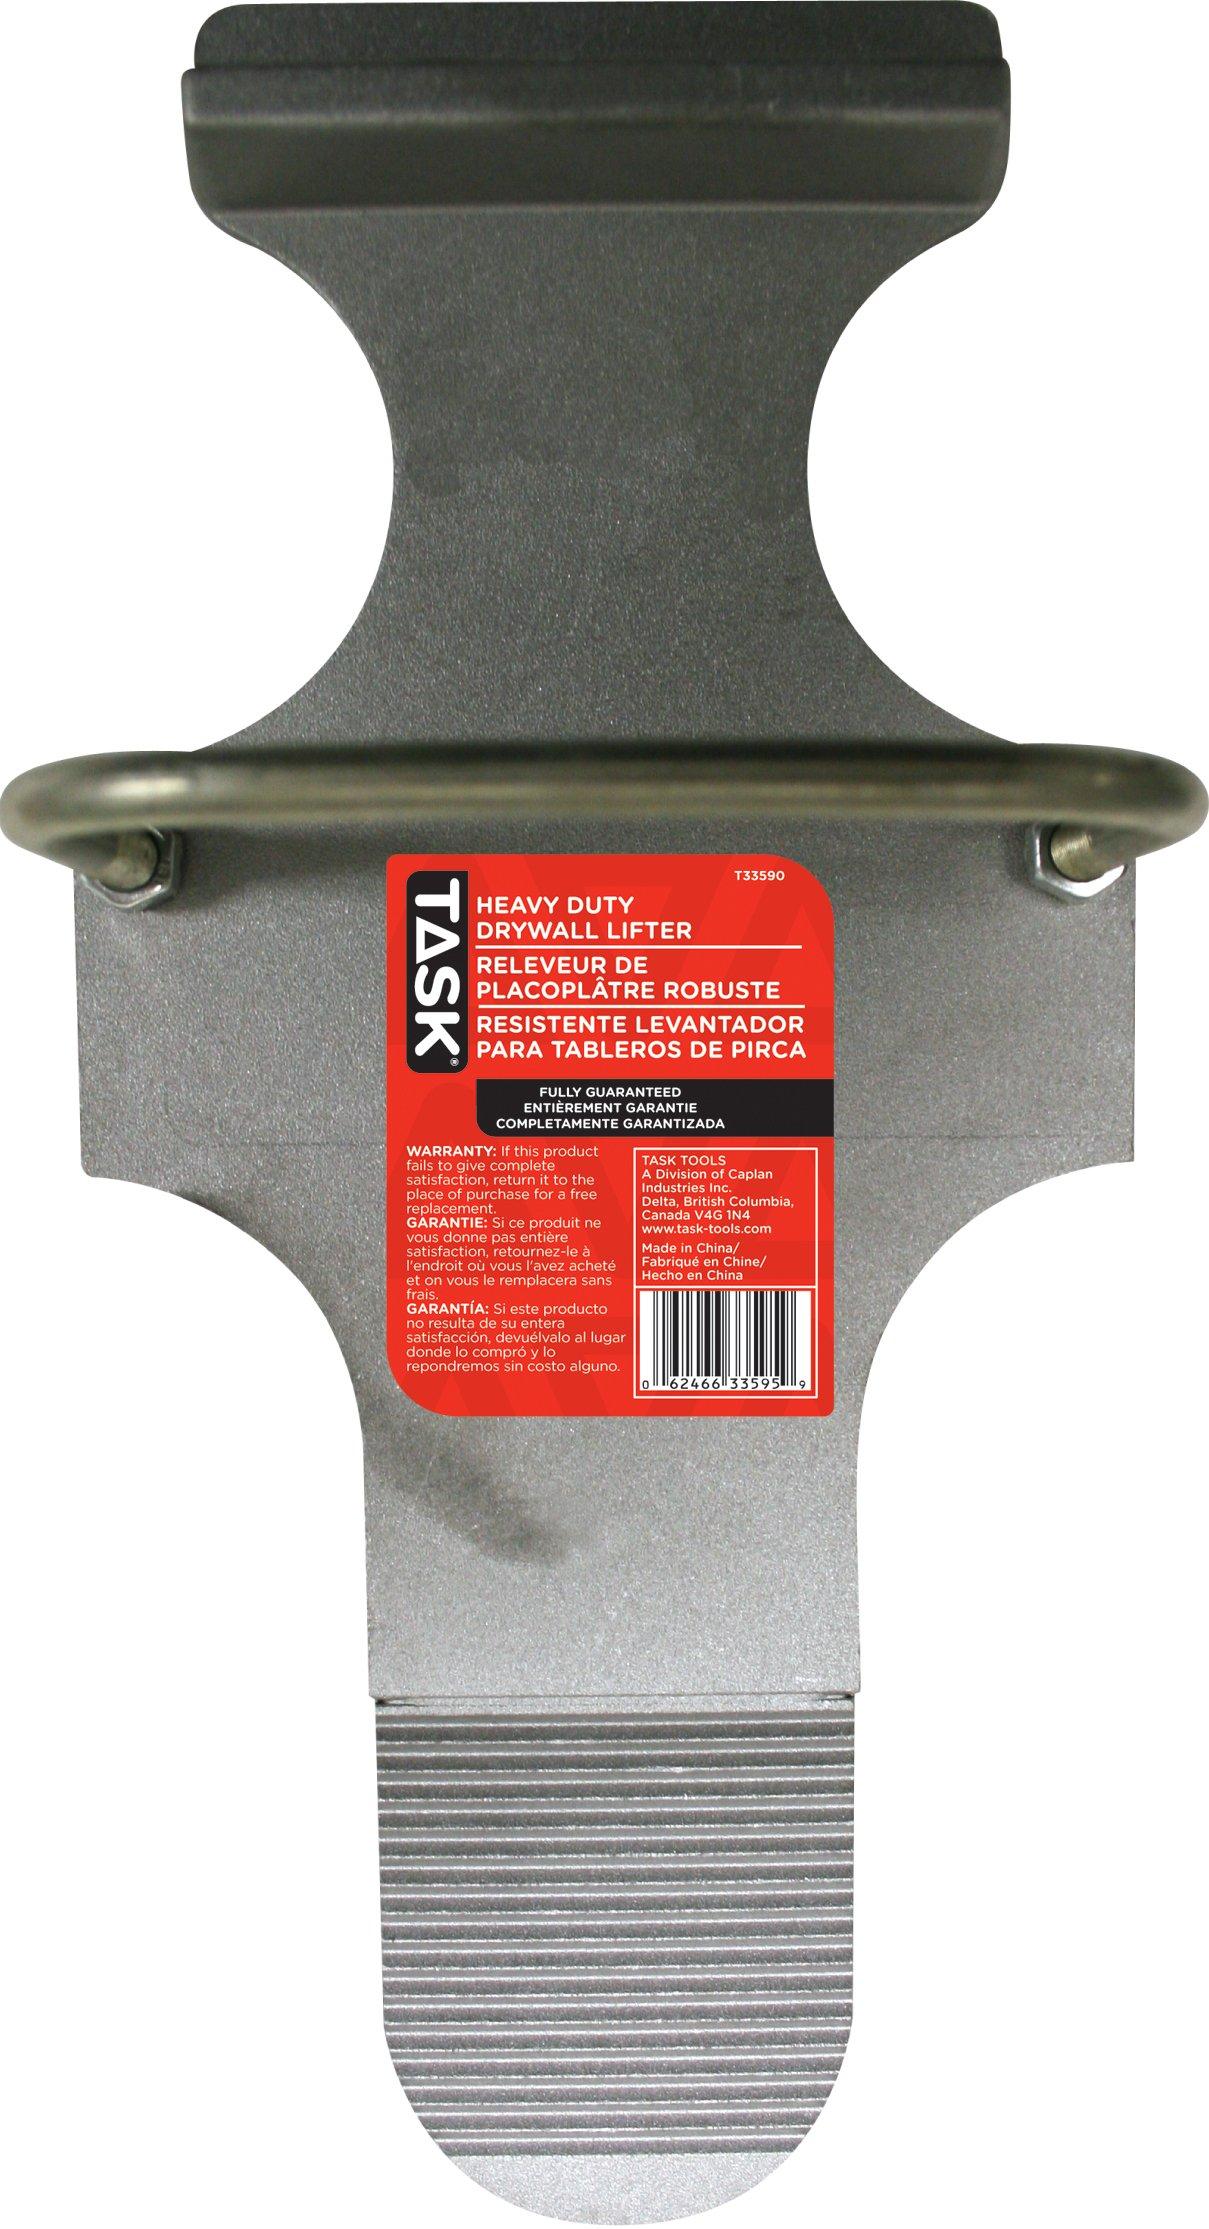 Task Tools T33595 Heavy-Duty Drywall Lifter